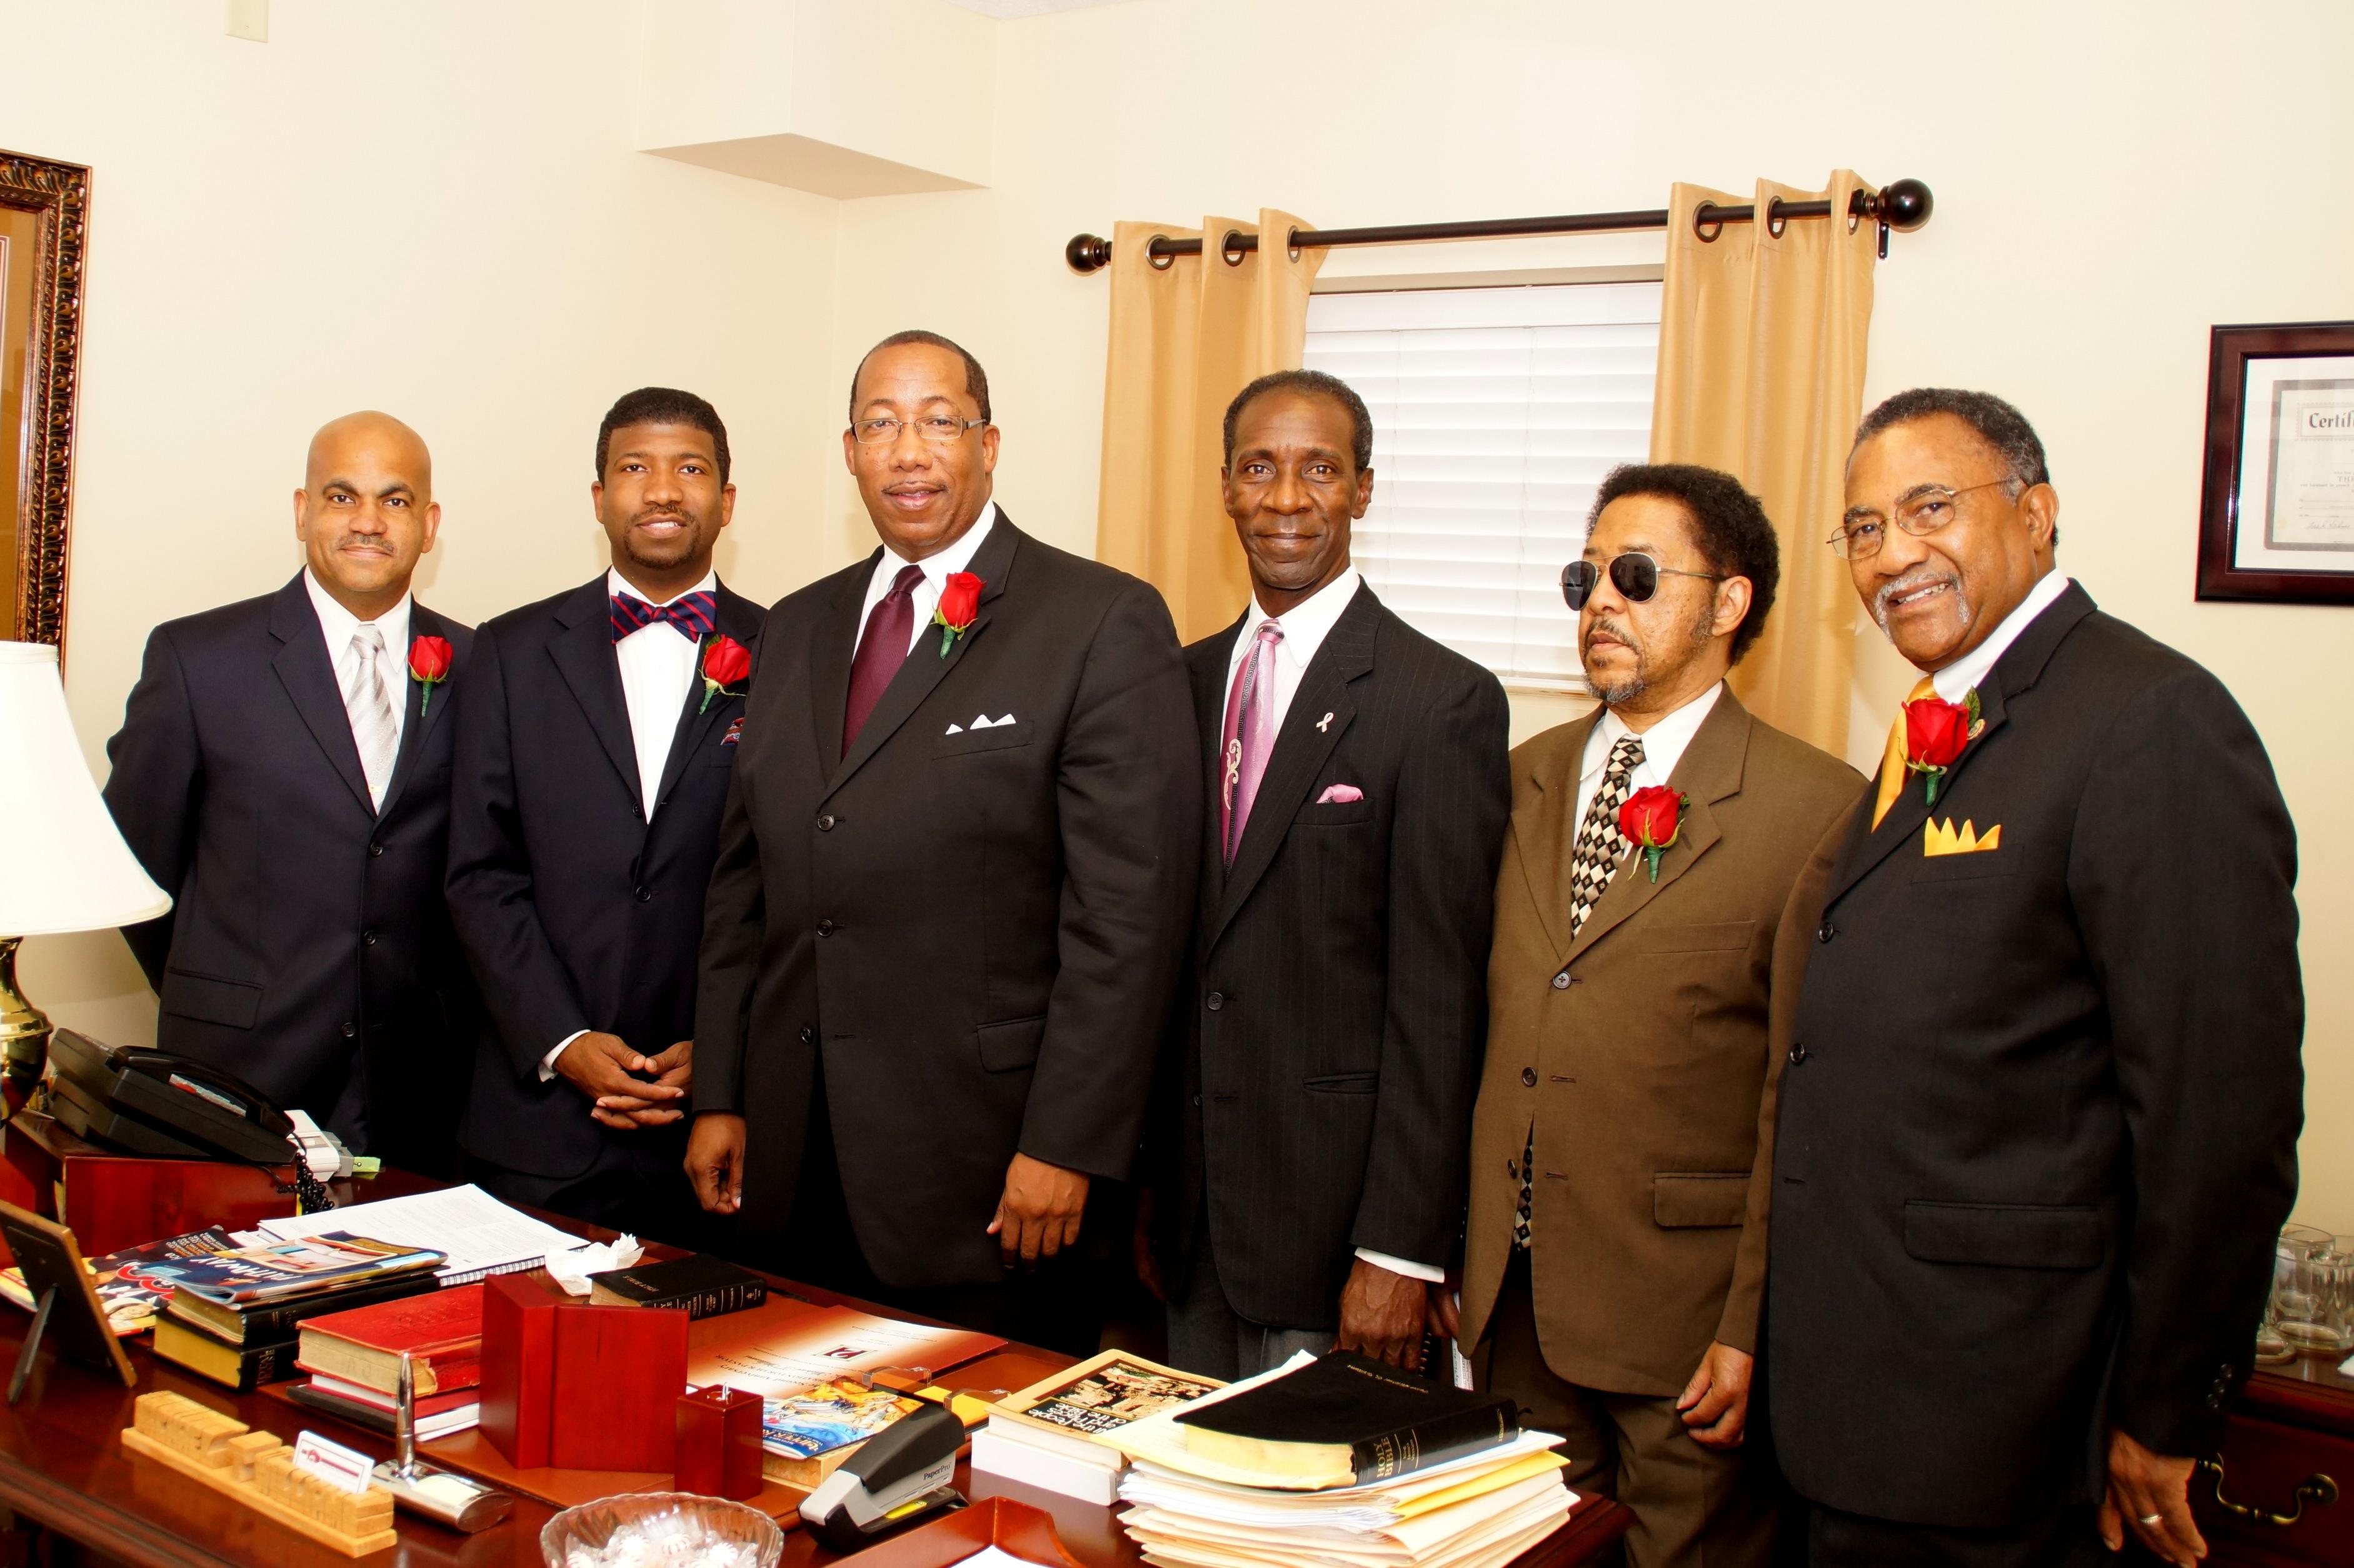 Pastors Anniversary Celebration